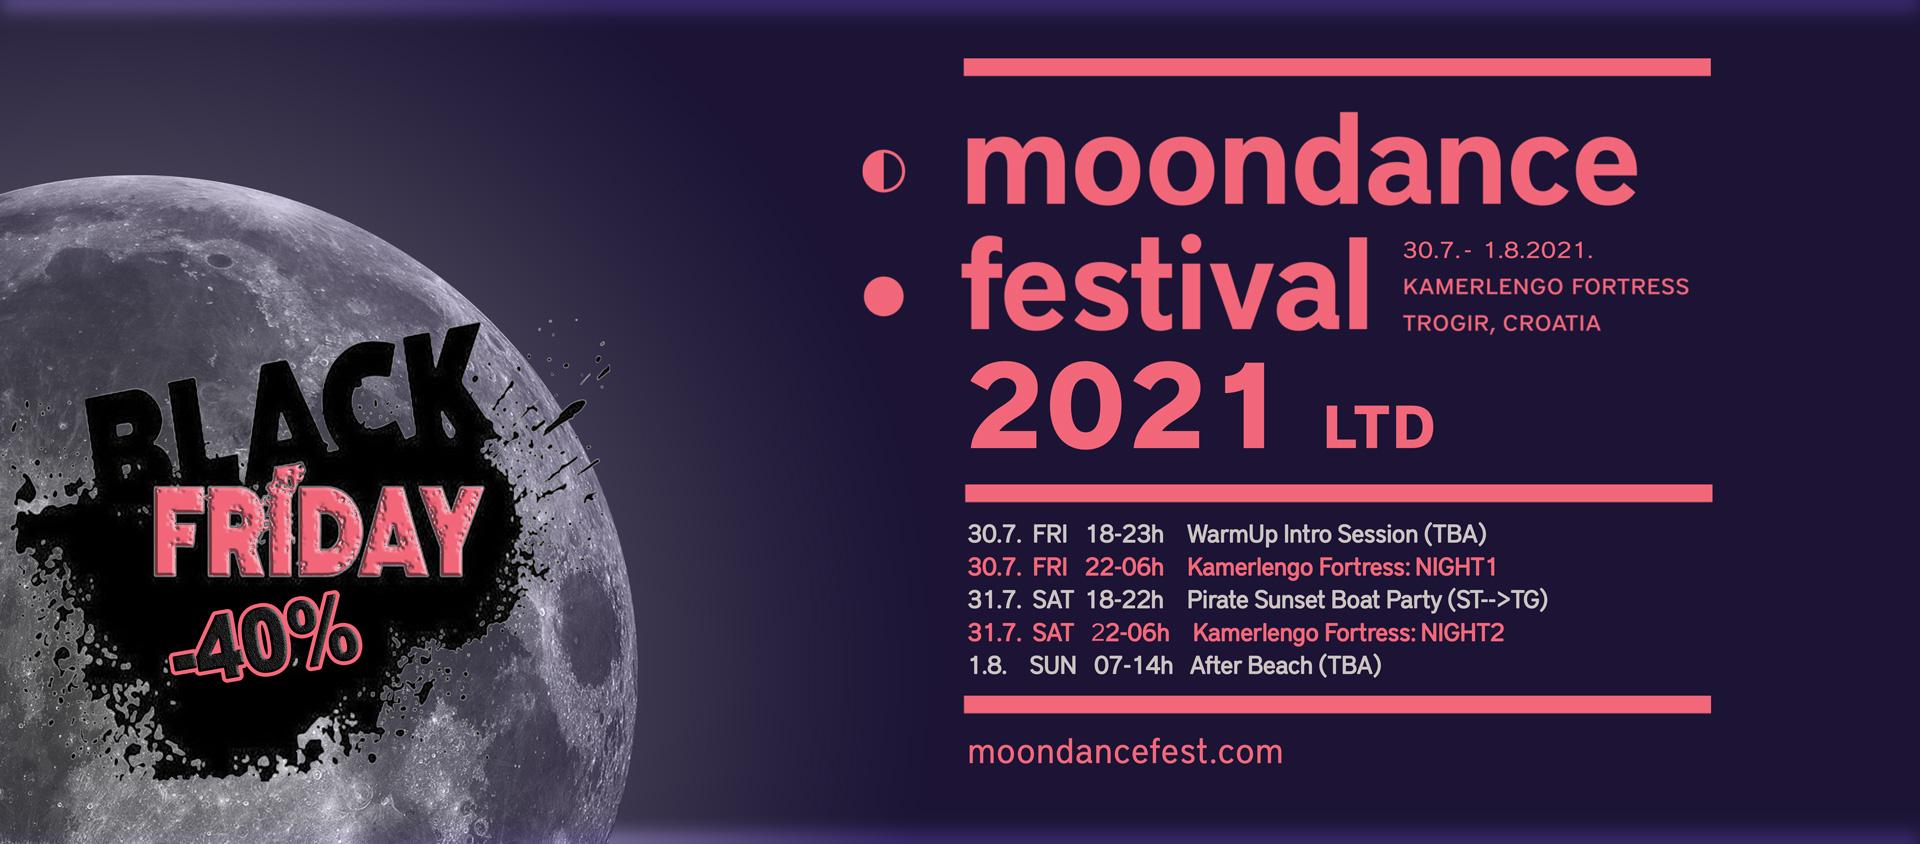 Hots Lunar Festival 2021